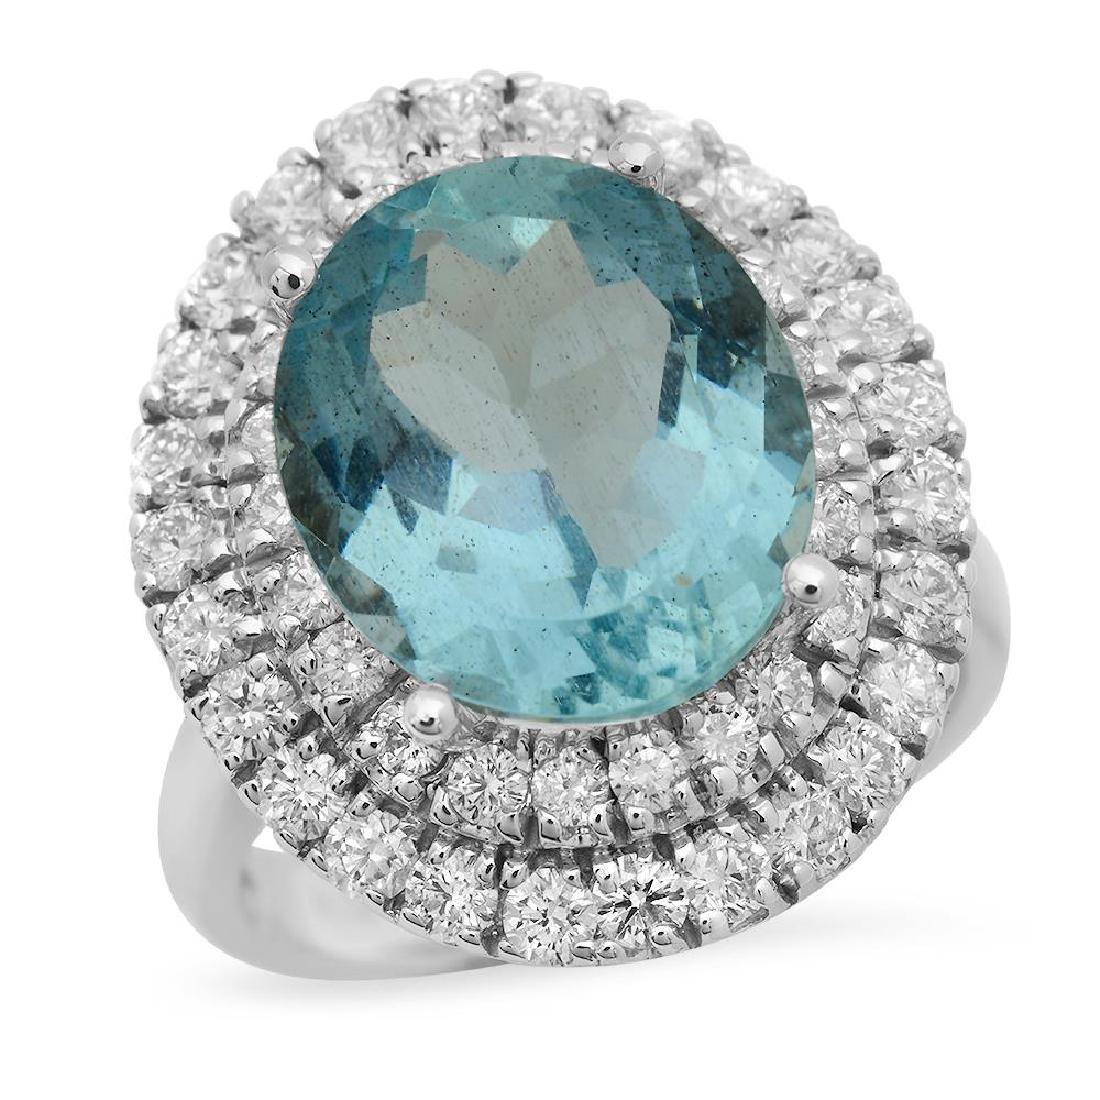 14K Gold 6.88ct Aquamarine 1.65ct Diamond Ring